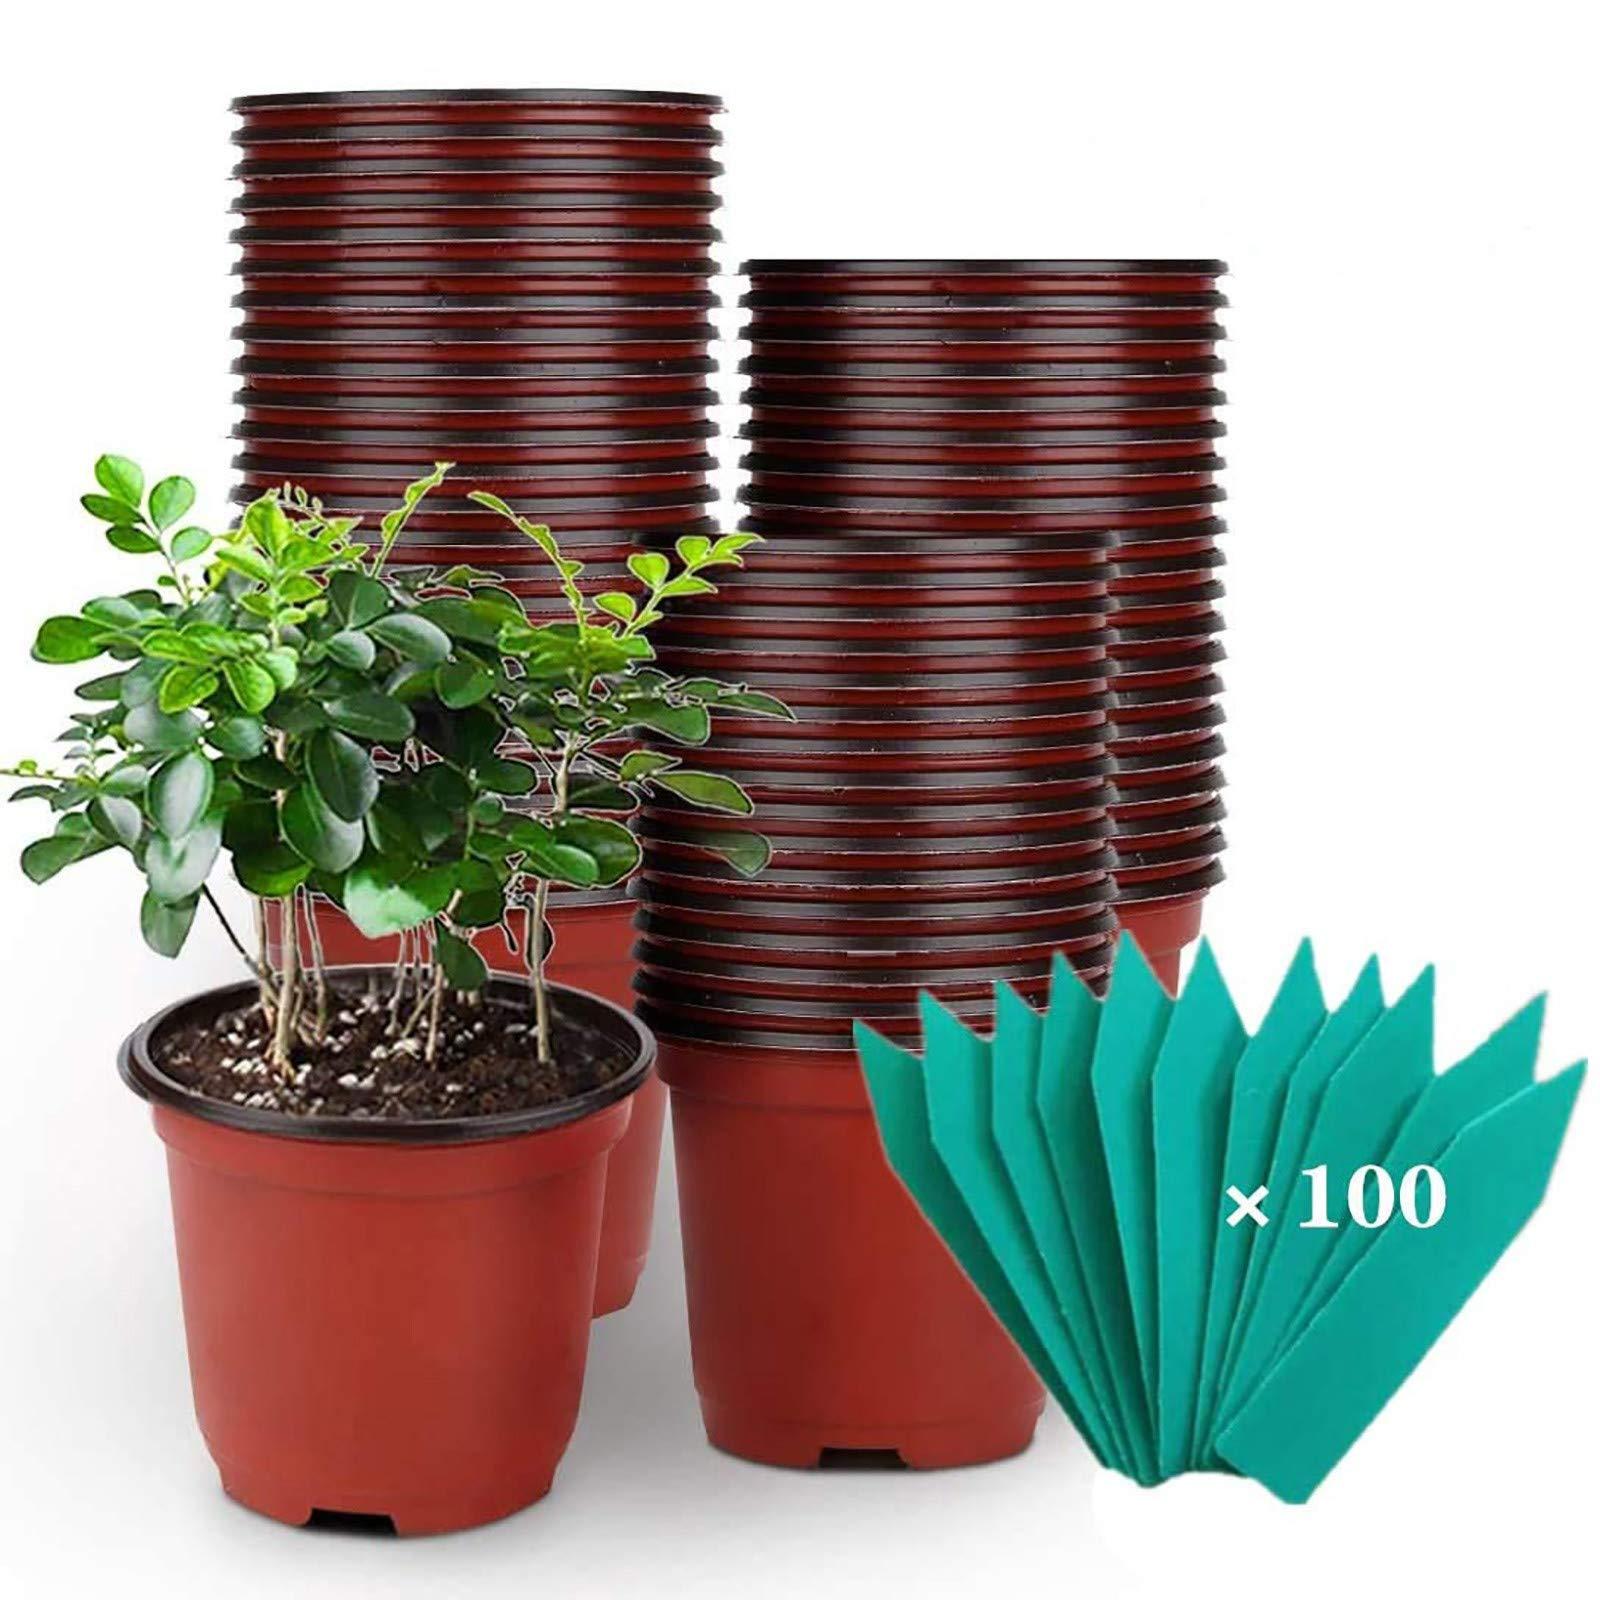 SHEEFLY 100 Pack Plant Nursery Pots 4 inch Plastic Plant Pots Soft